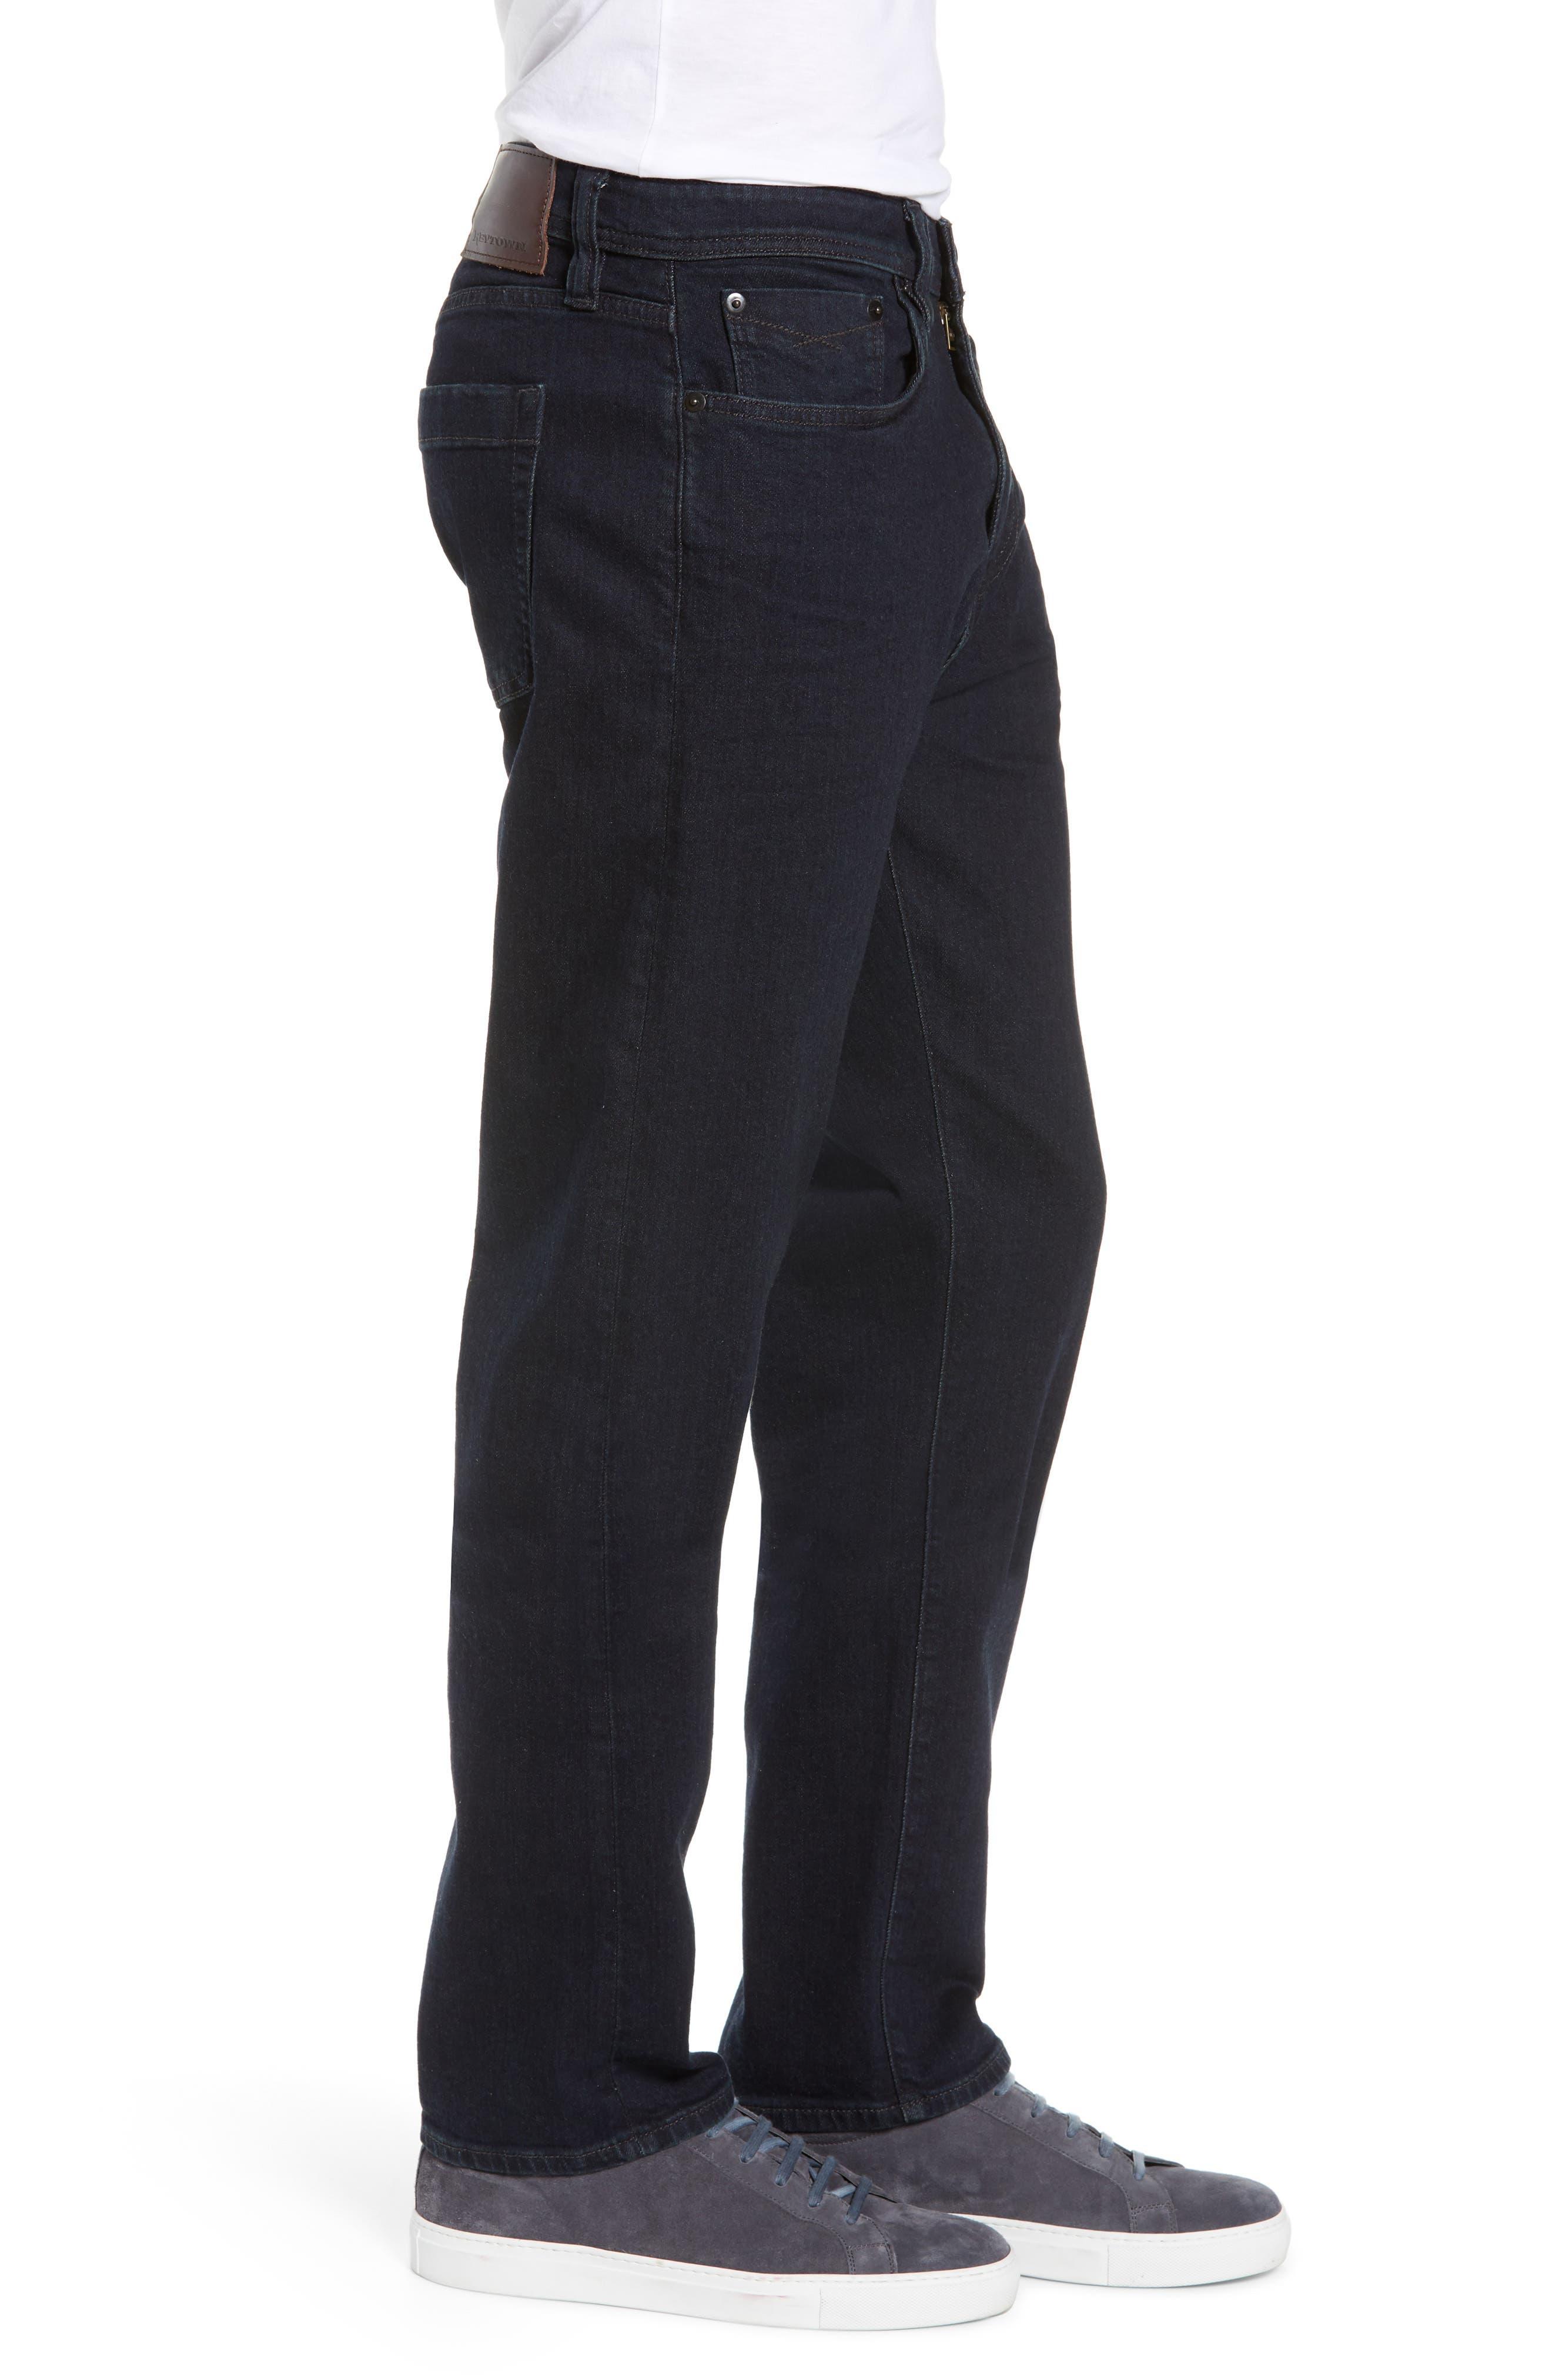 REVTOWN,                             Automatic Straight Leg Jeans,                             Alternate thumbnail 3, color,                             RINSE INDIGO